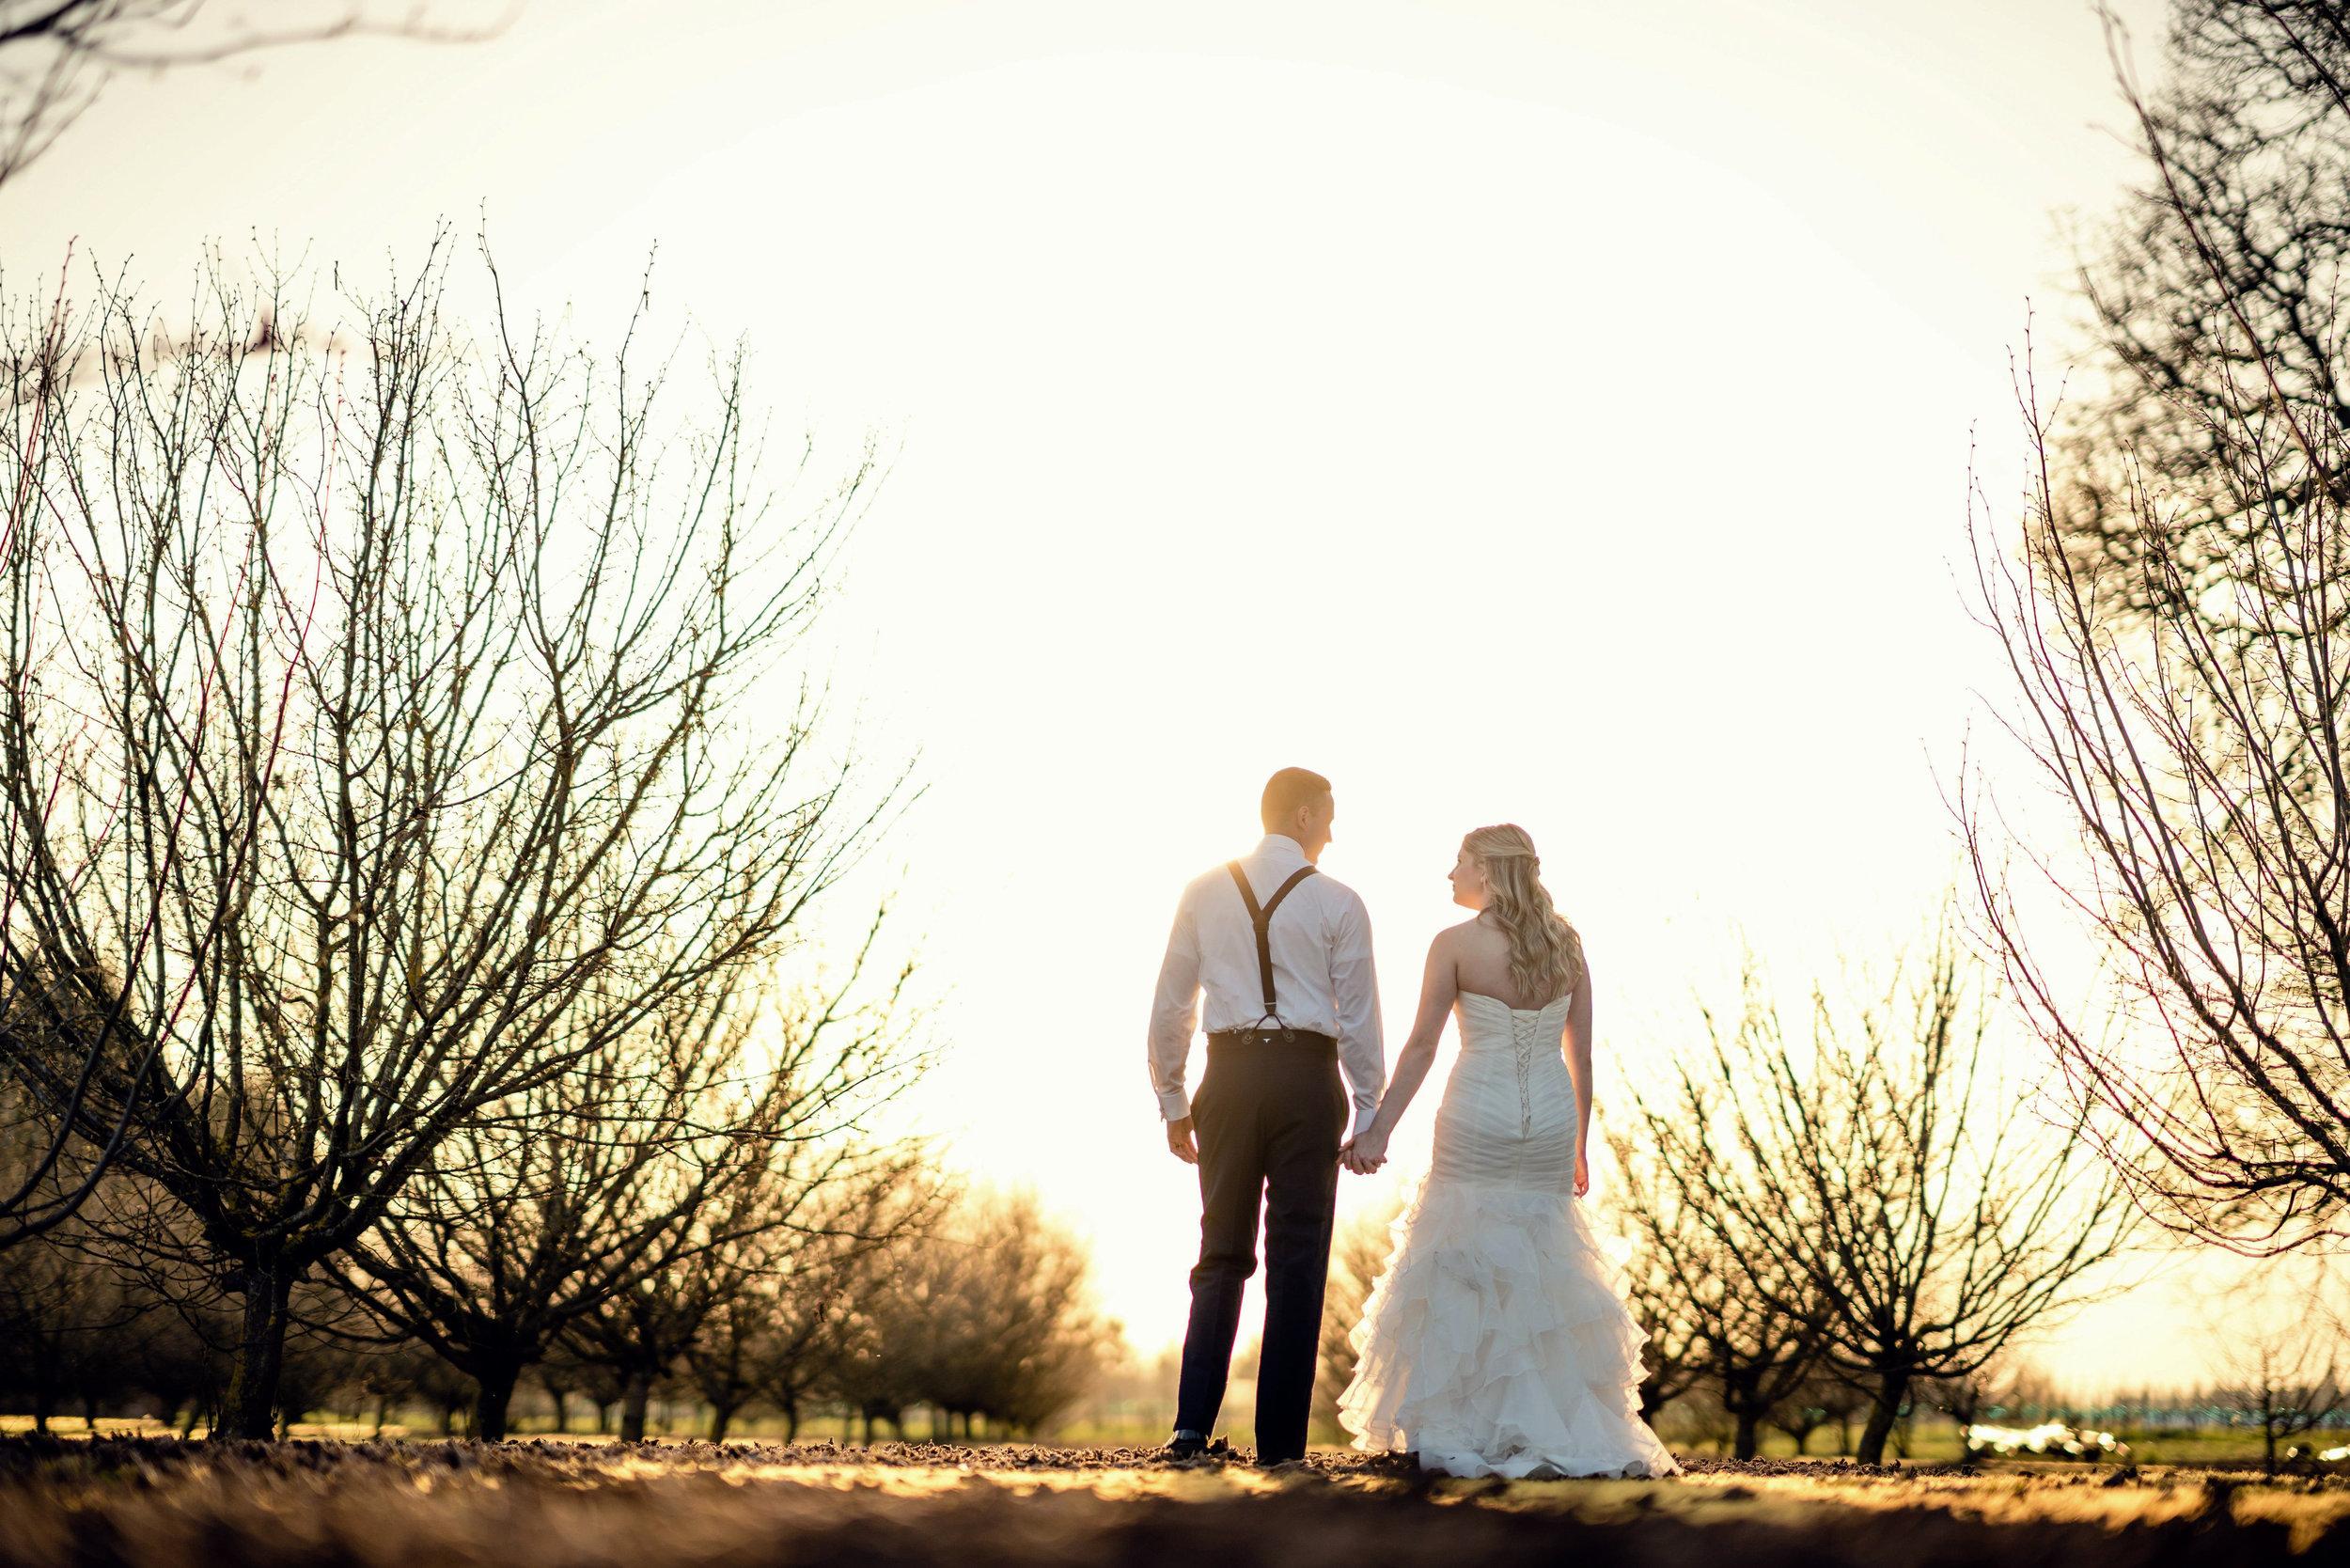 Benjamin Wedding-Photos 2-0135.jpg